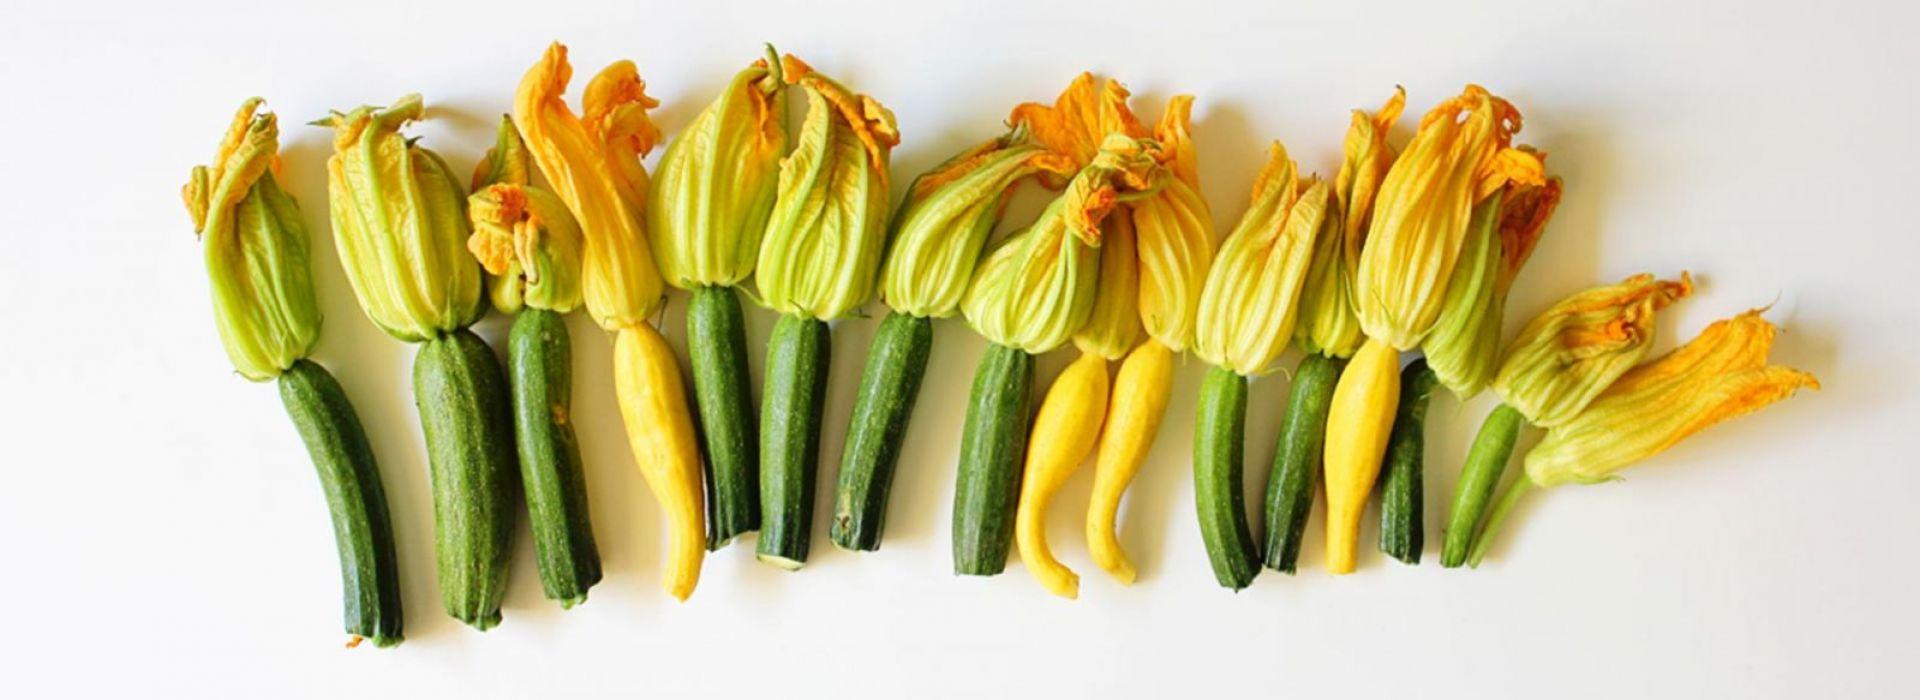 Mini Zucchini with Flower